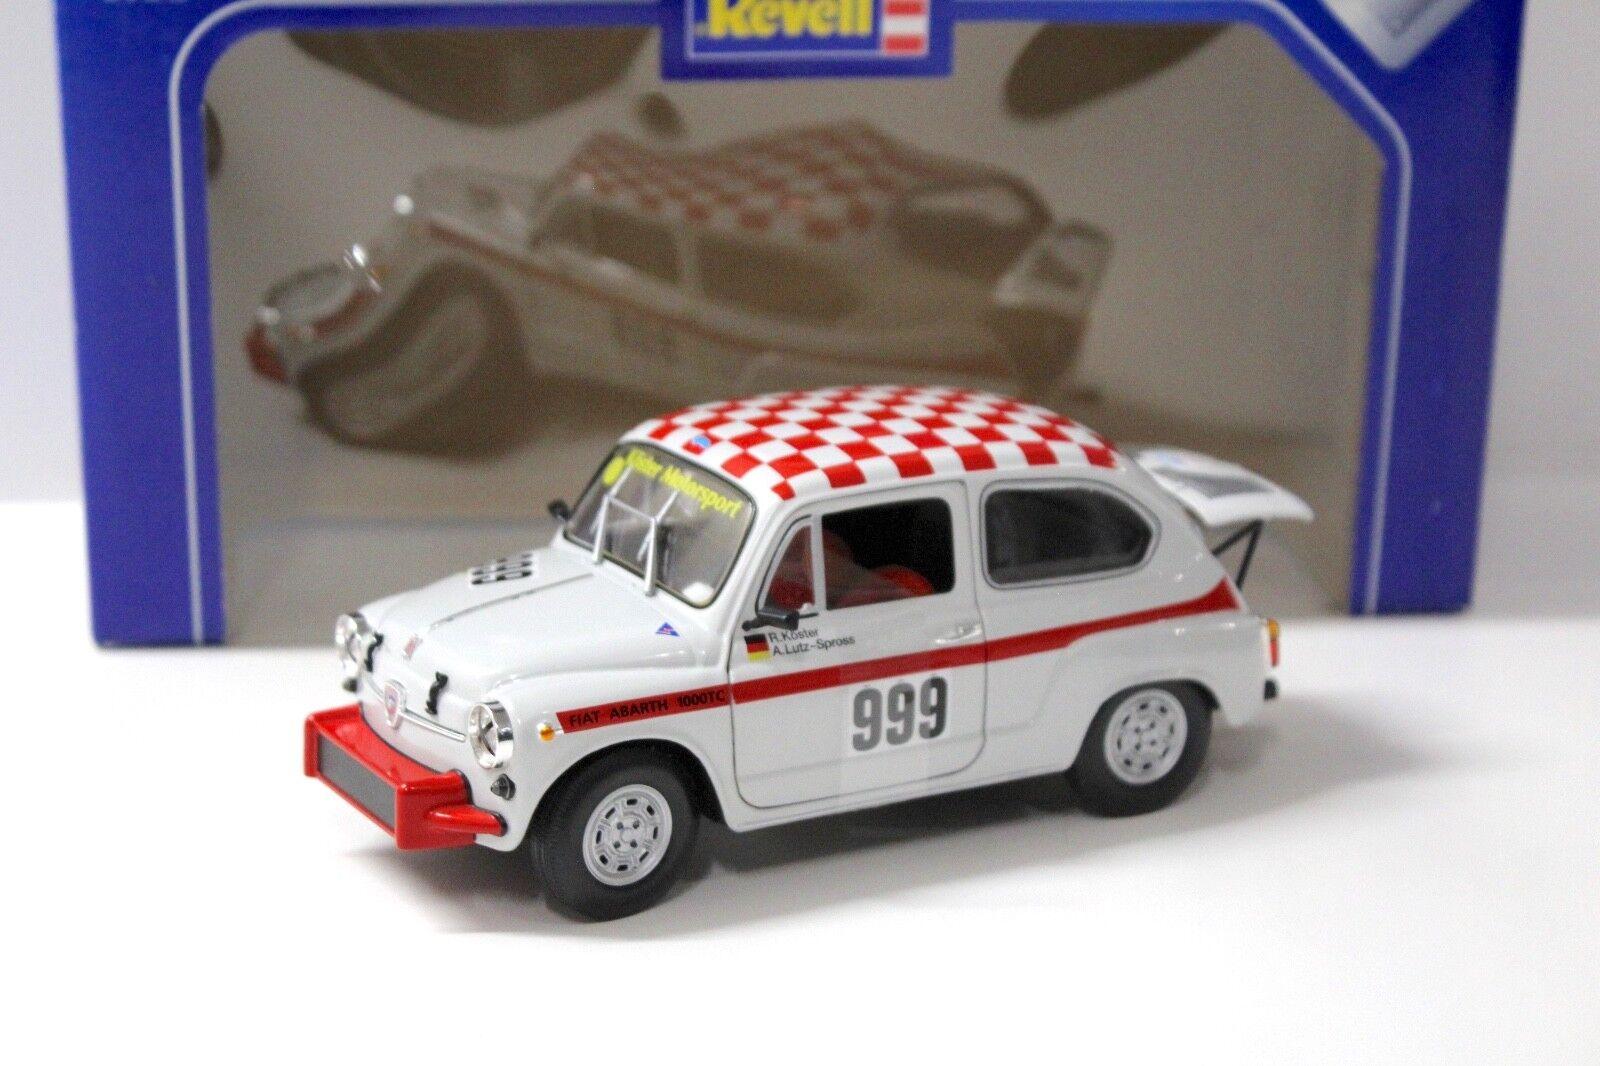 punto de venta barato 1 18 Revell Fiat Abarth 1000 TC blanco blanco blanco rojo  999 New en Premium-modelCoches  envío gratis